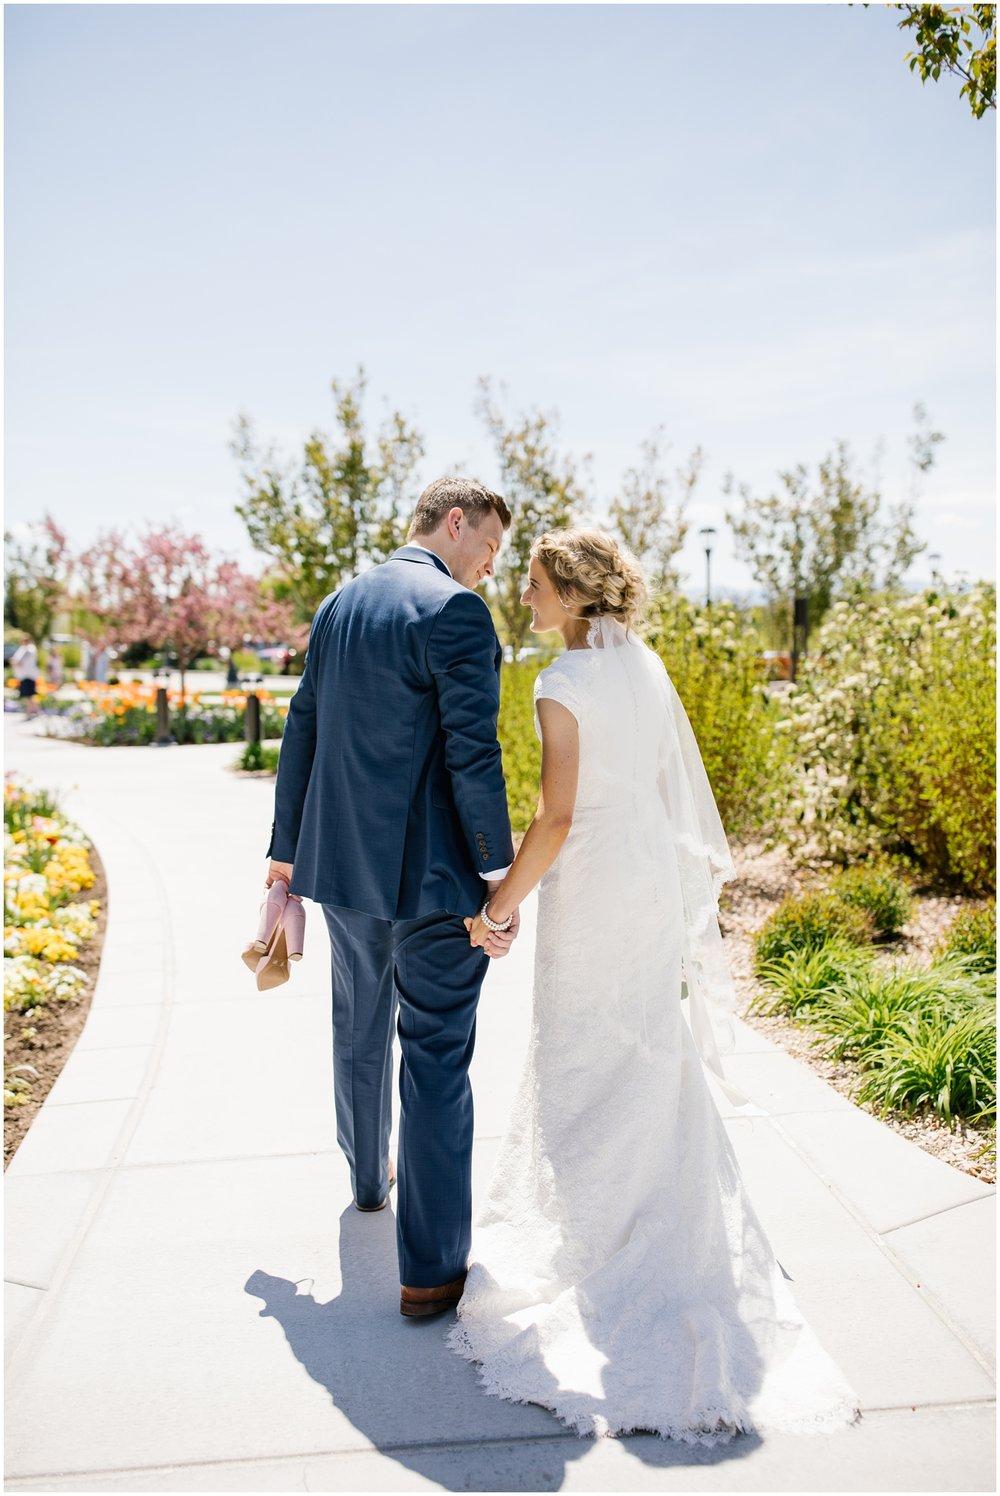 TA-Wedding-167_Lizzie-B-Imagery-Utah-Wedding-Photographer-Park-City-Salt-Lake-City-Thanksgiving-Point-Ashton-Gardens-Lehi-Utah.jpg